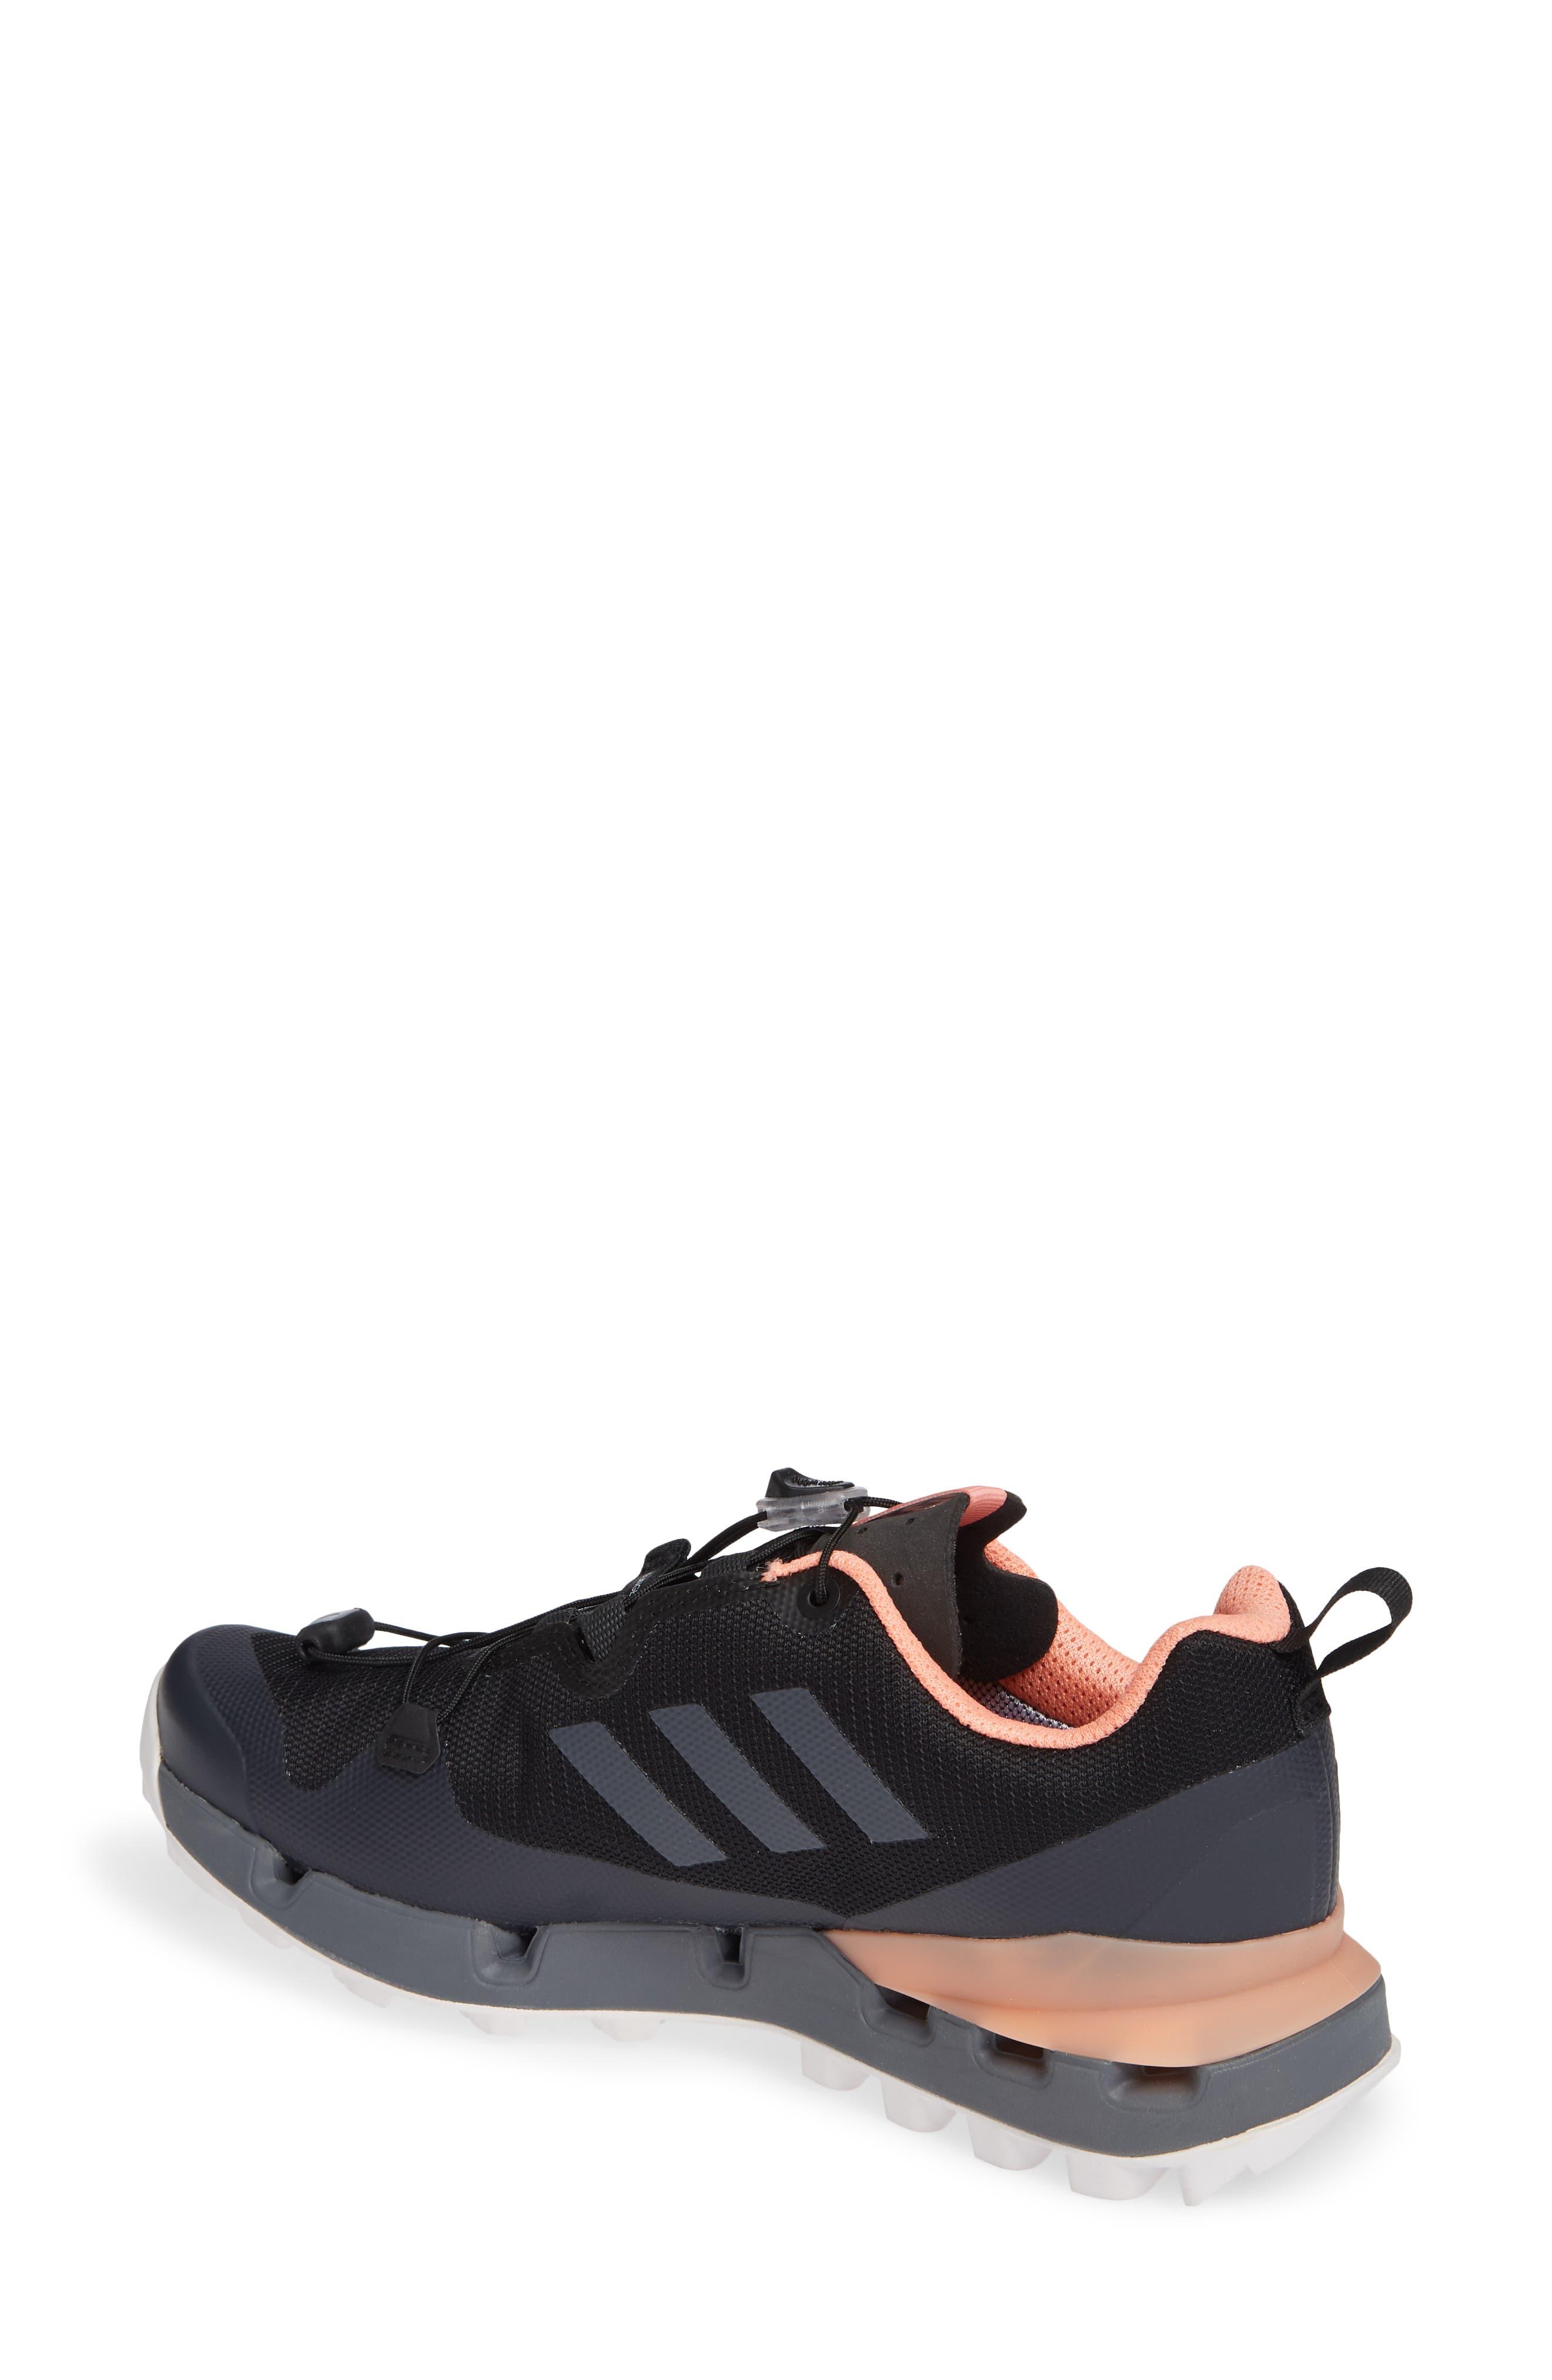 Terrex Fast GTX<sup>®</sup> Surround Hiking Shoe,                             Alternate thumbnail 2, color,                             BLACK/ GREY FIVE/ CHALK CORAL